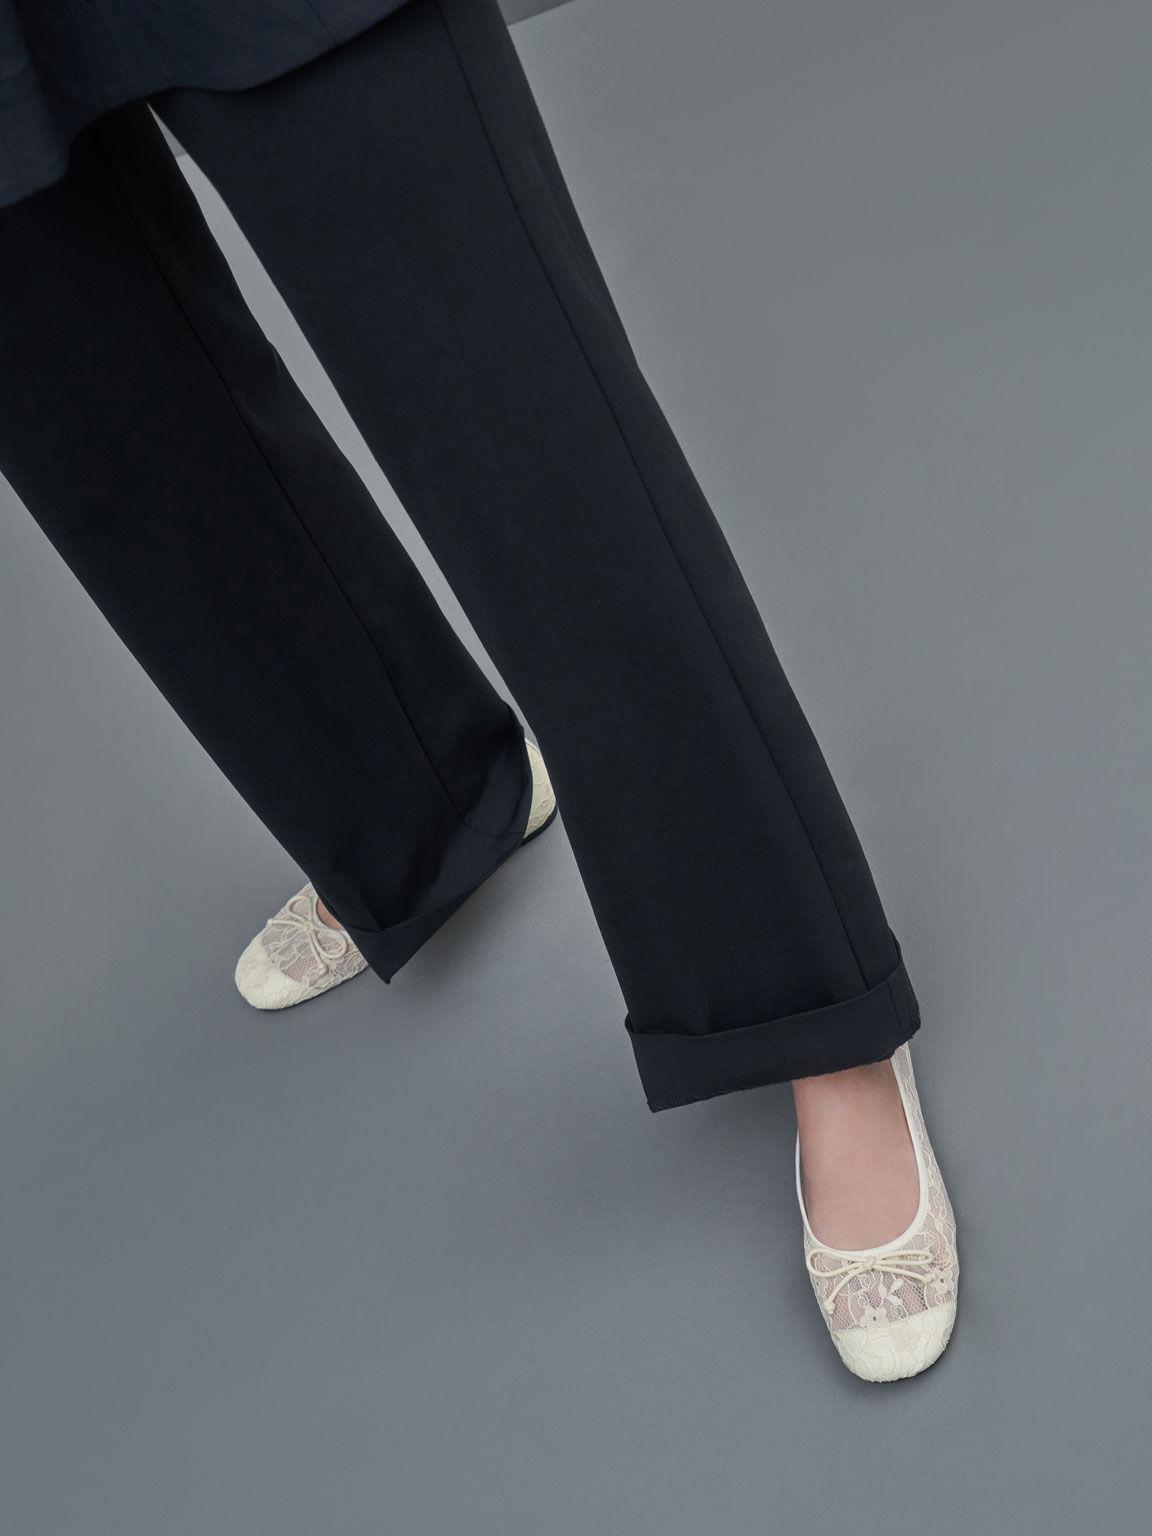 Bow-Tie Lace Ballerina Flats, Cream, hi-res